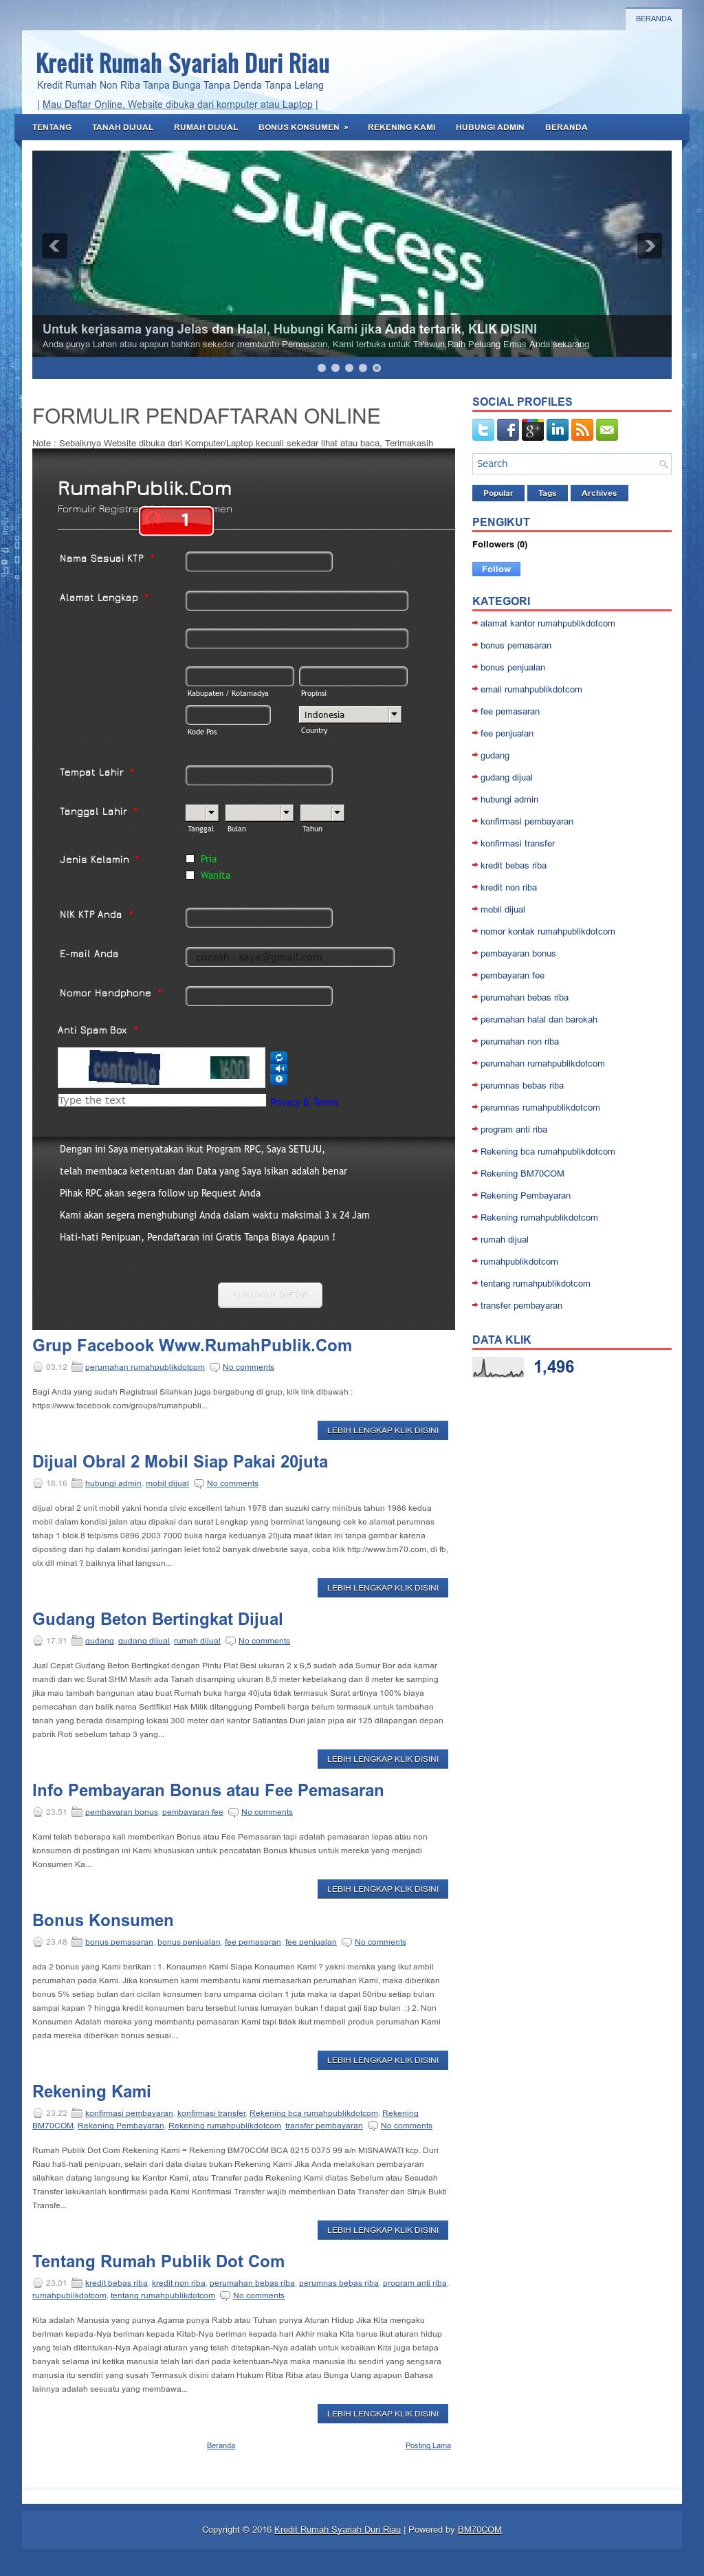 Toko Bm70com Duri Riau Competitors Revenue And Employees Owler Pindah Kredit0 Company Profile